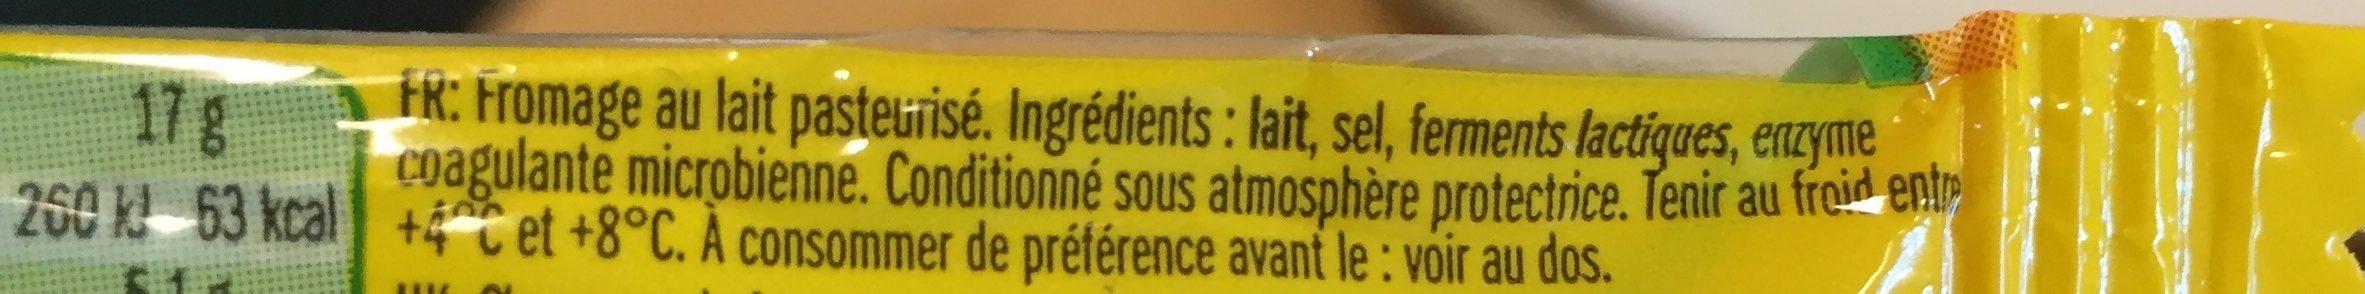 Leerdammer mini l'original - Ingrédients - fr